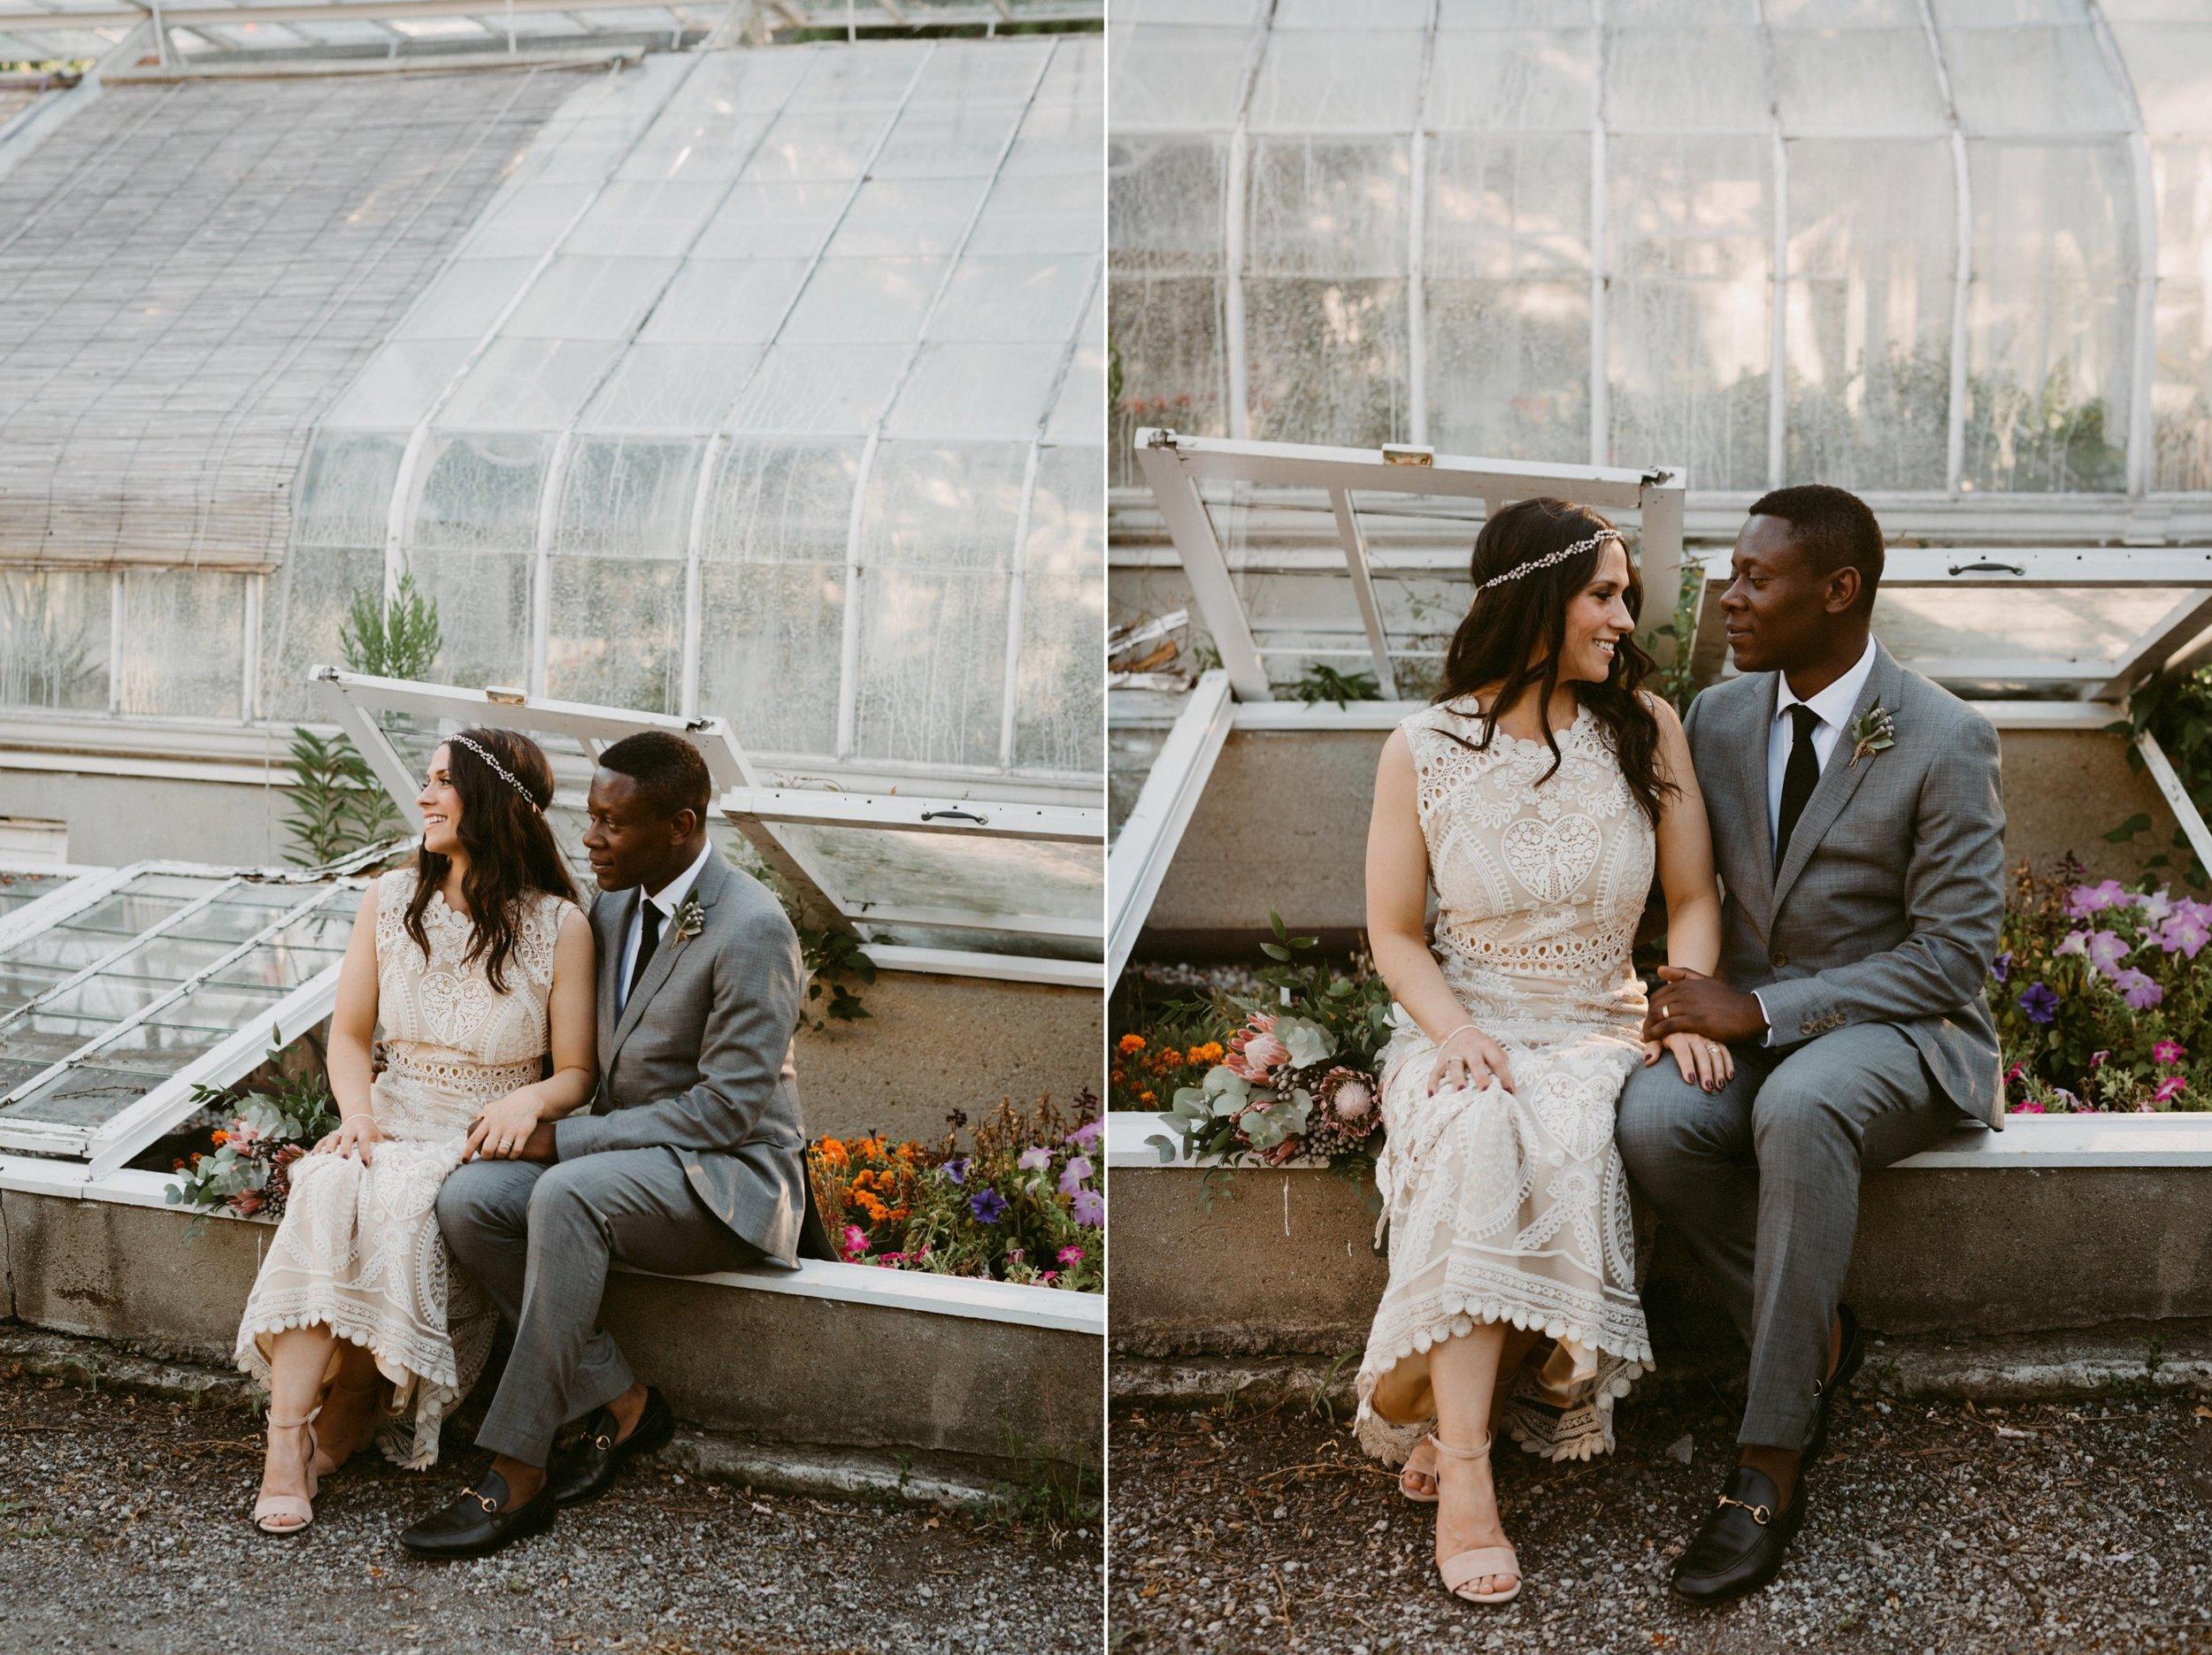 056_Spadina House Wedding (378 of 748)_Spadina House Wedding (381 of 748)_House_Spadina_Wedding_Toronto_intimate.jpg